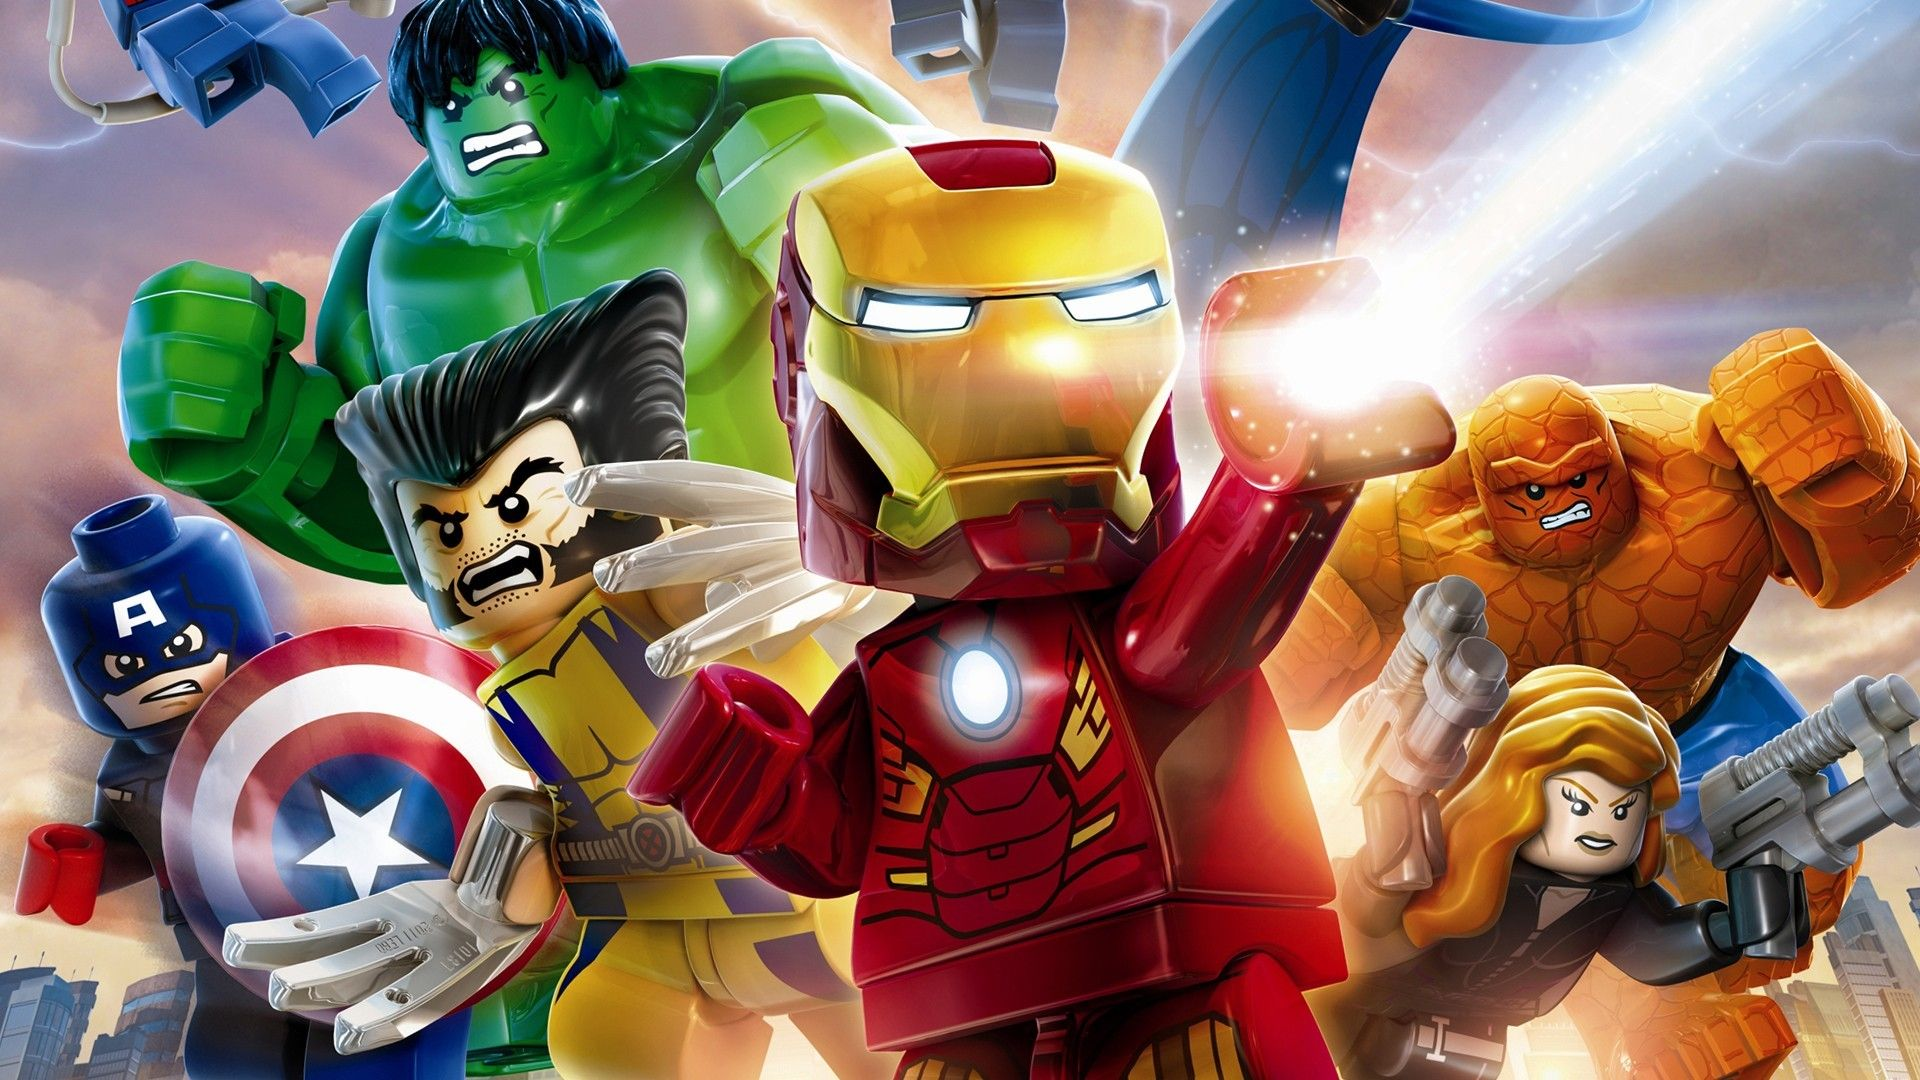 Ces cool jeux video pinterest lego lego marvel and marvel video game lego marvel super heroes wallpapers and backgrounds voltagebd Images